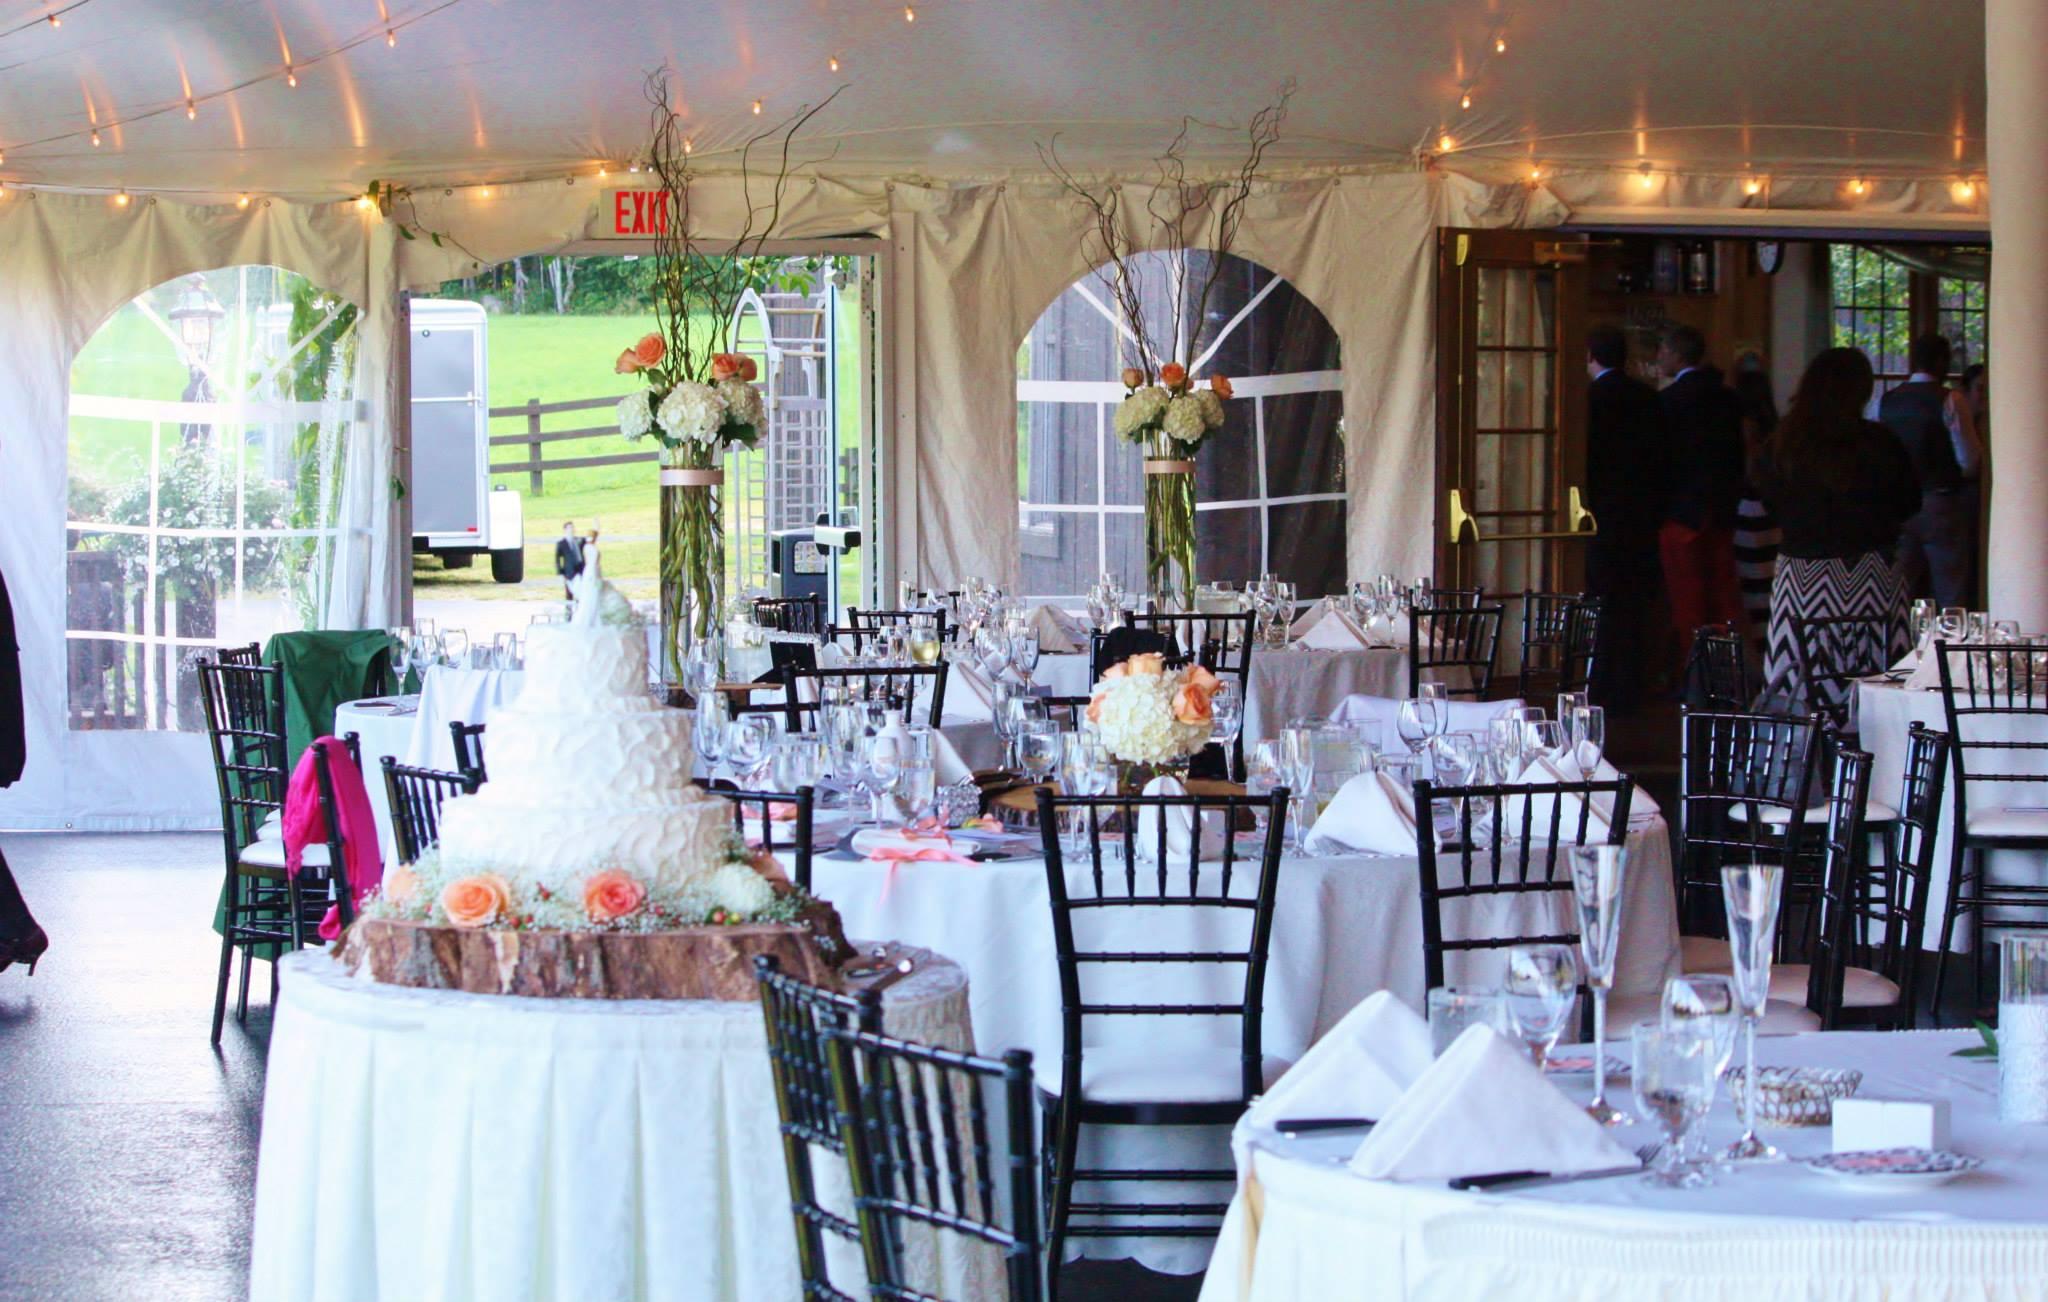 For sale rustic wedding decor wood slices tallshort vases vases tall venueg junglespirit Choice Image